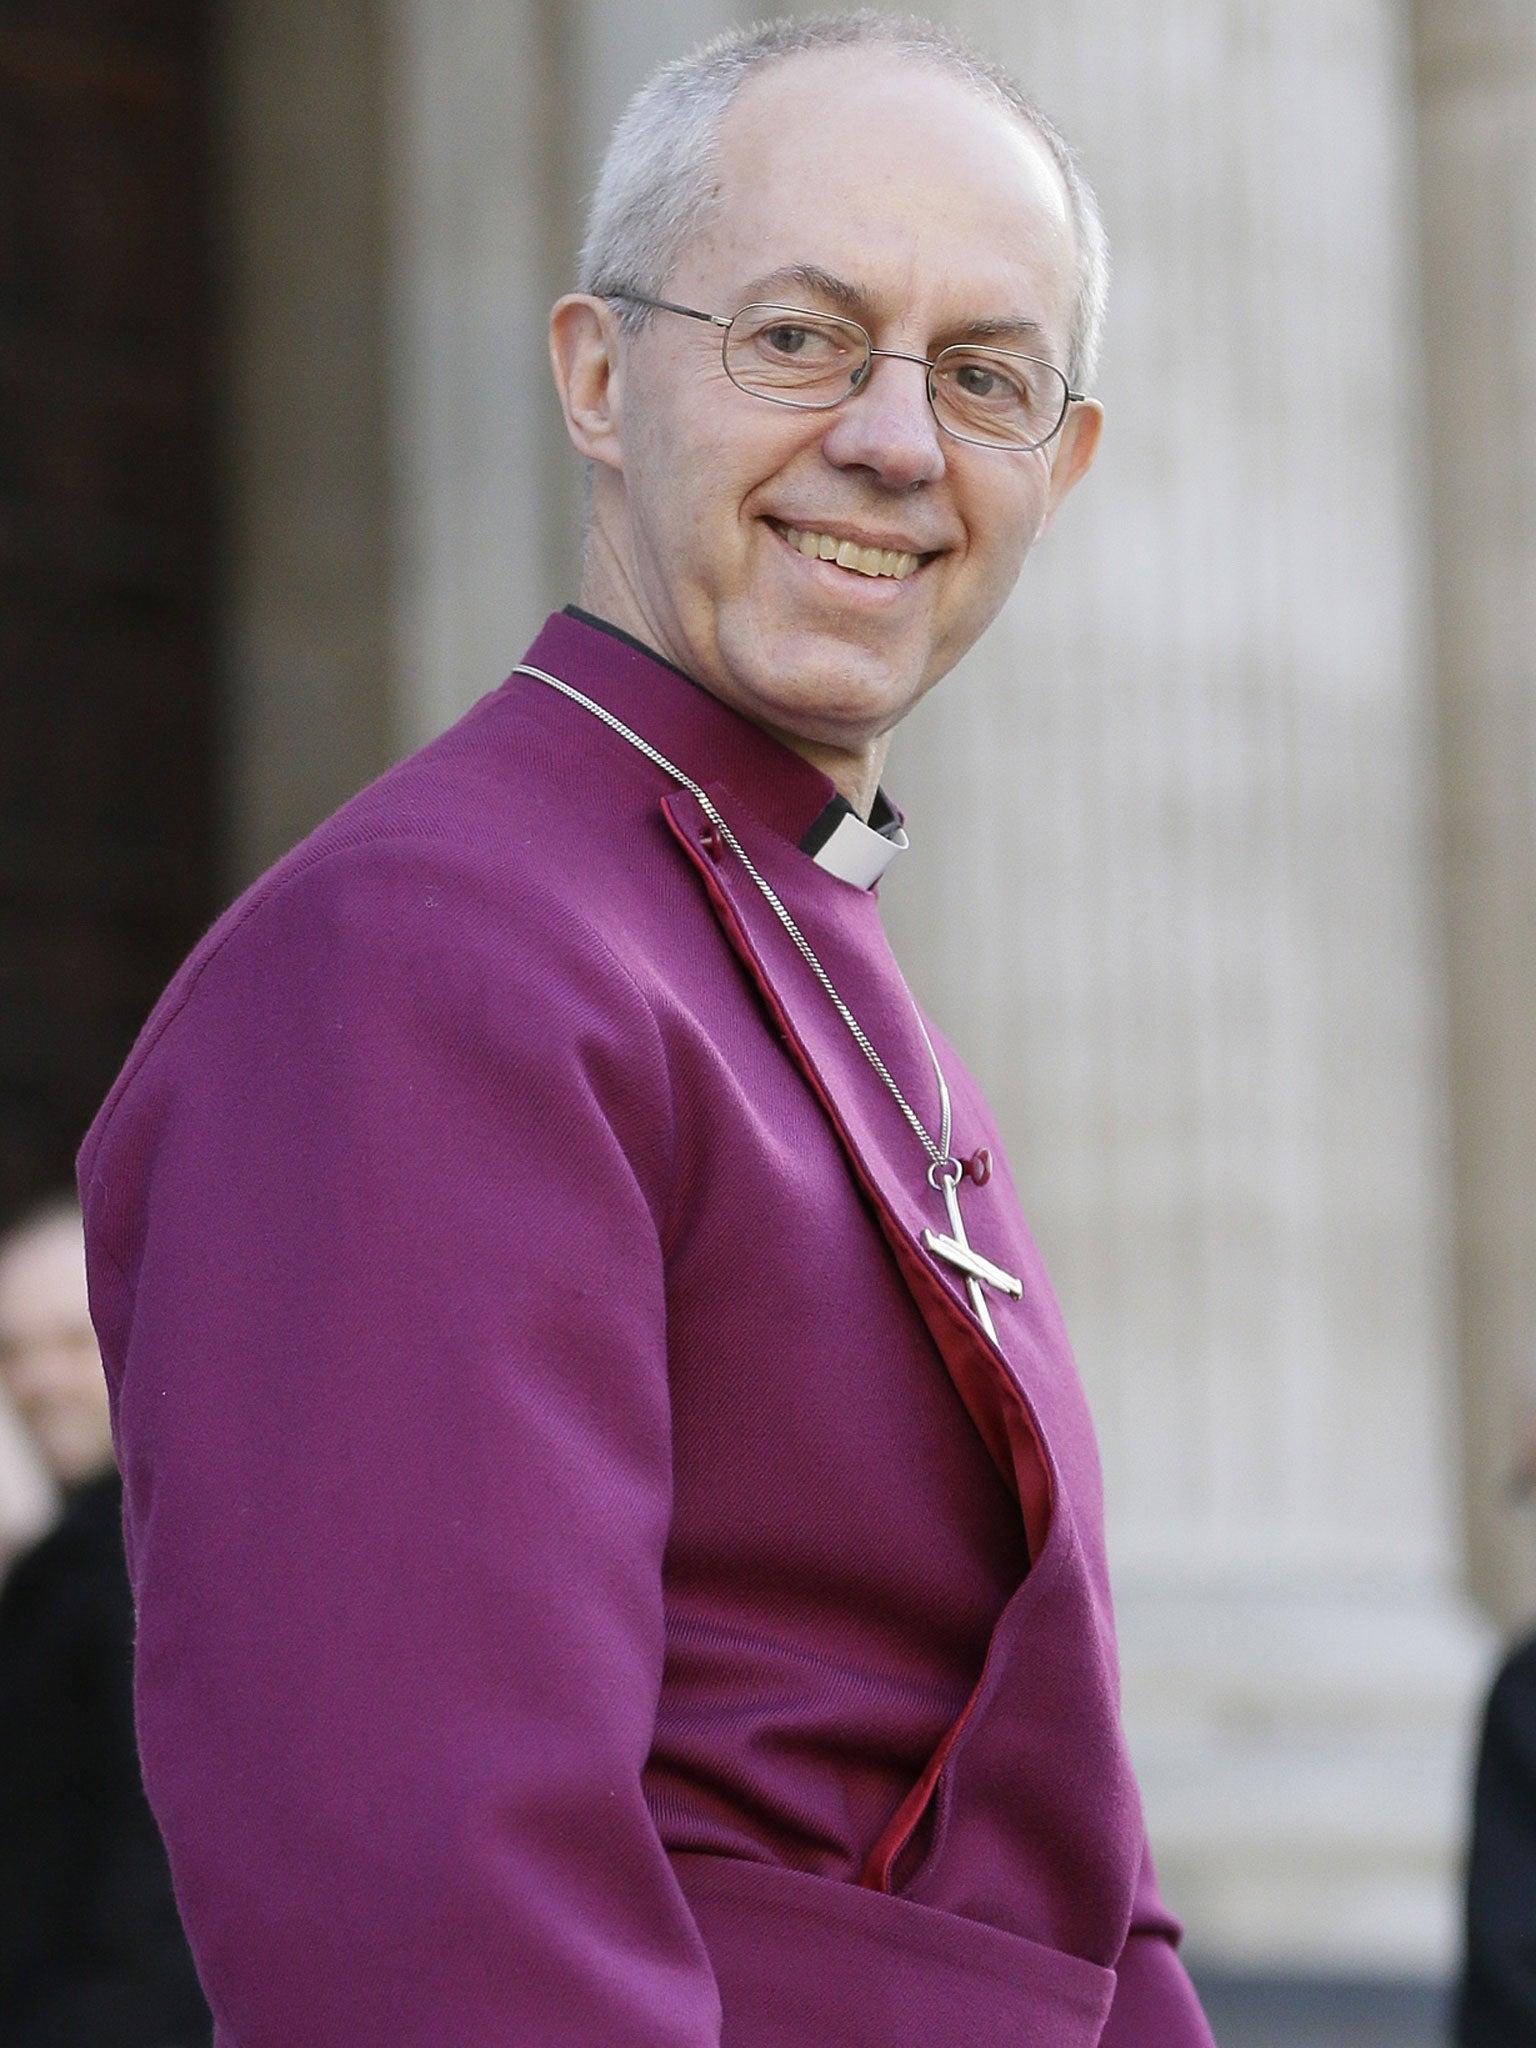 Samsclub Credit Login >> Archbishop of Canterbury Justin Welby rows back on war on Wonga: 'Loan sharks are worse' | The ...